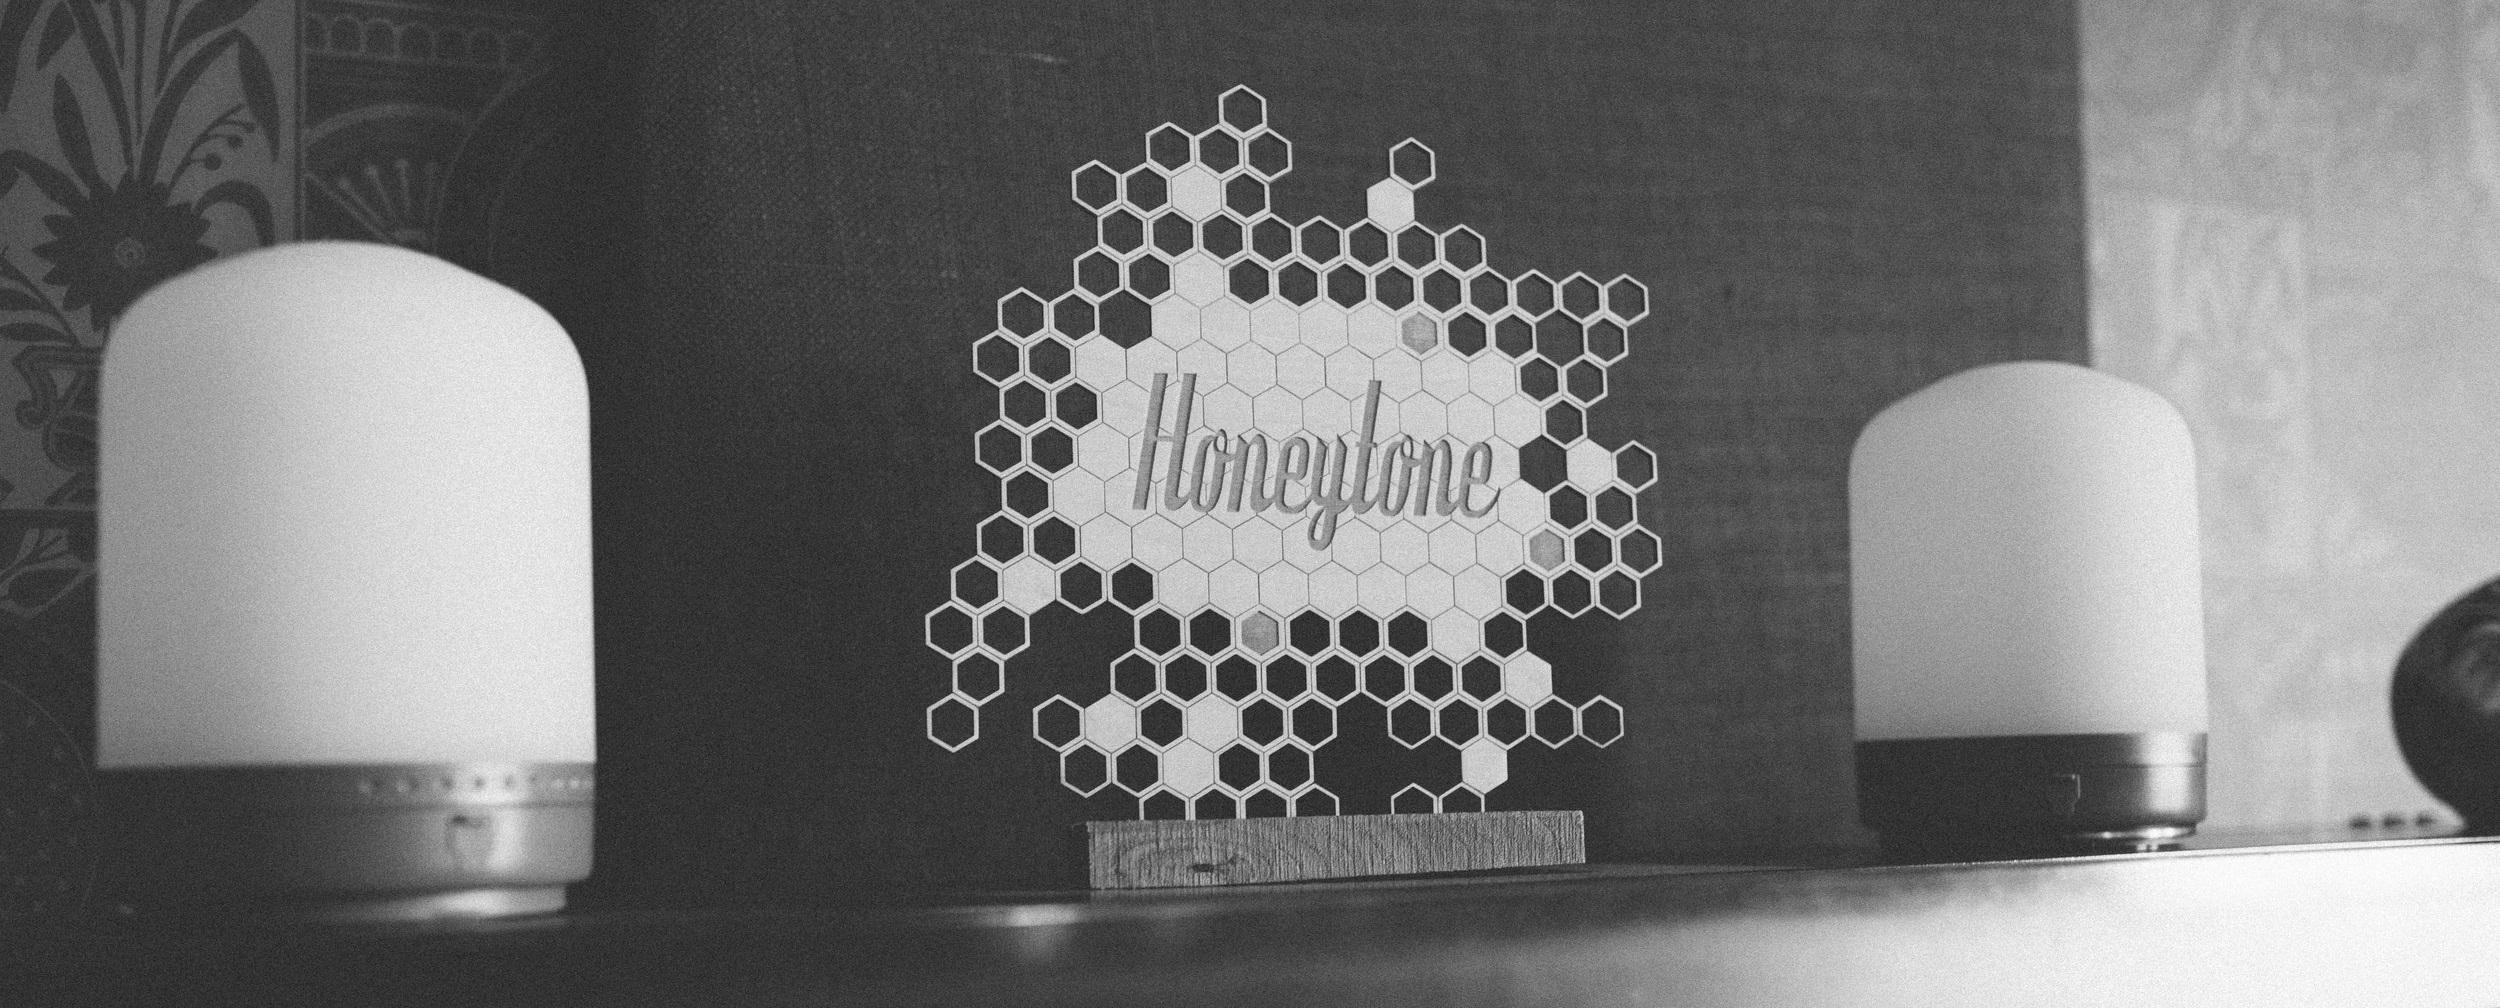 HoneyTone88.jpg